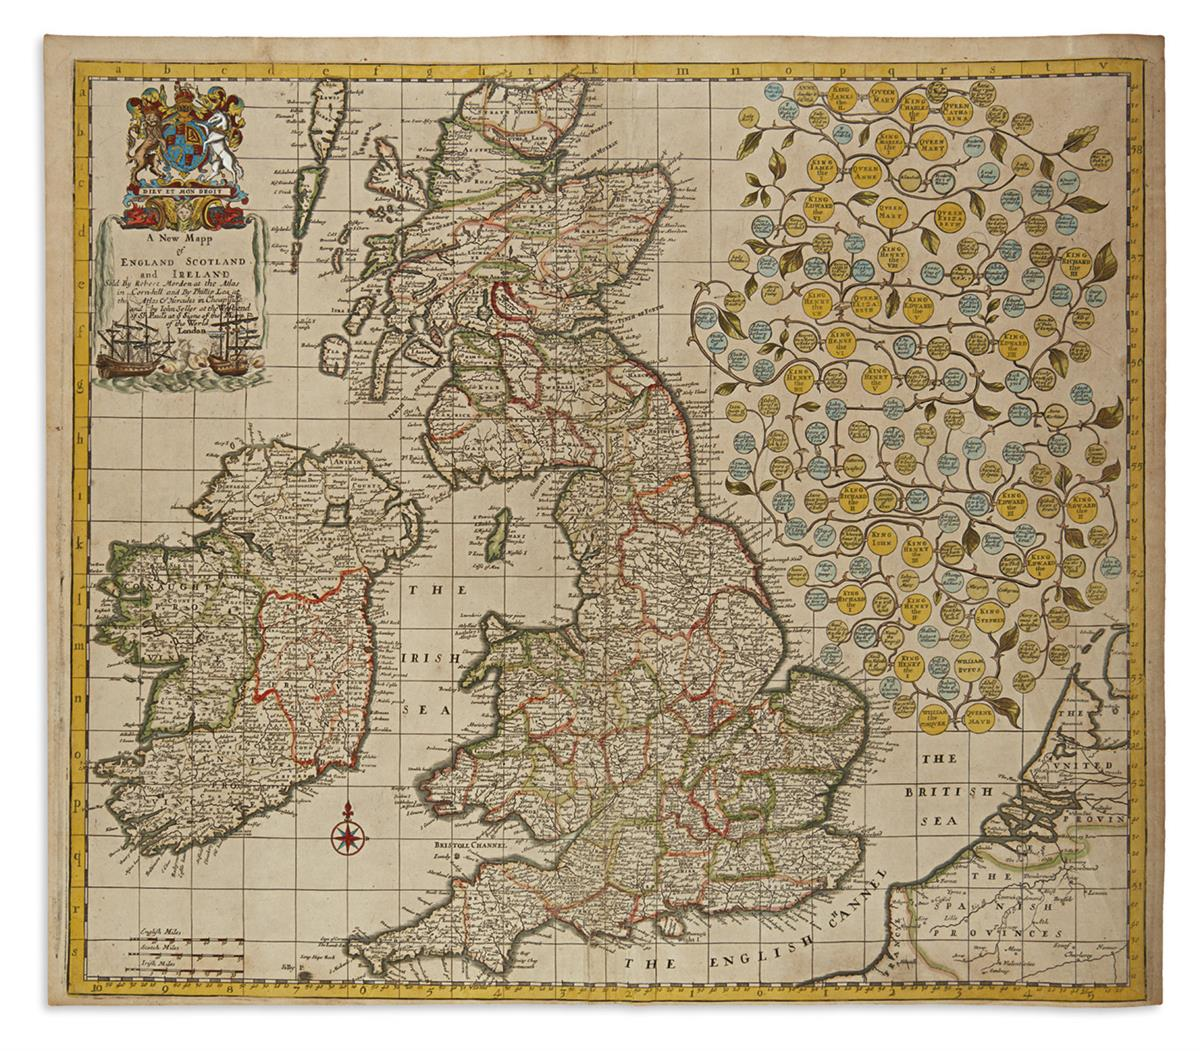 MORDEN-ROBERT-A-New-Mapp-of-England-Scotland-and-Ireland